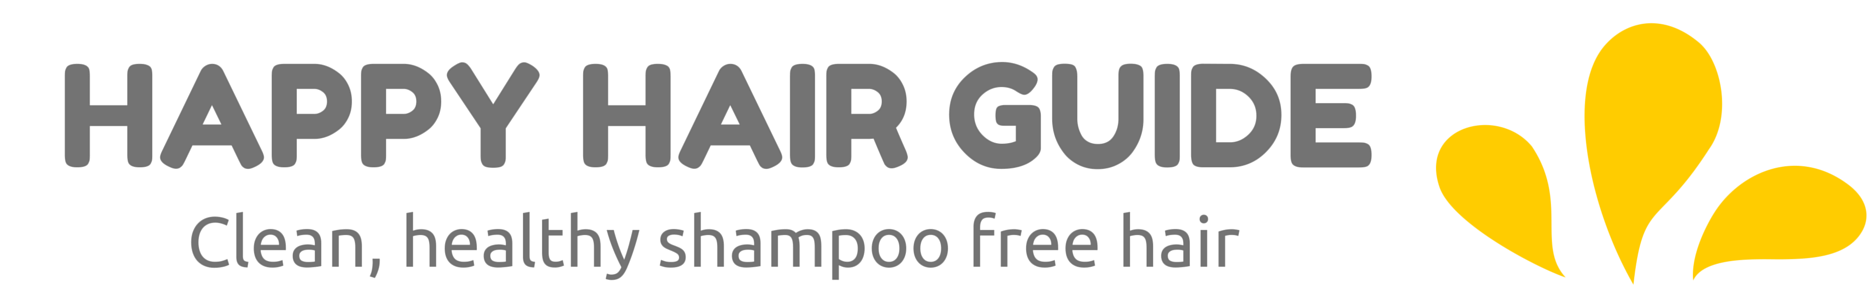 Happy Hair Guide